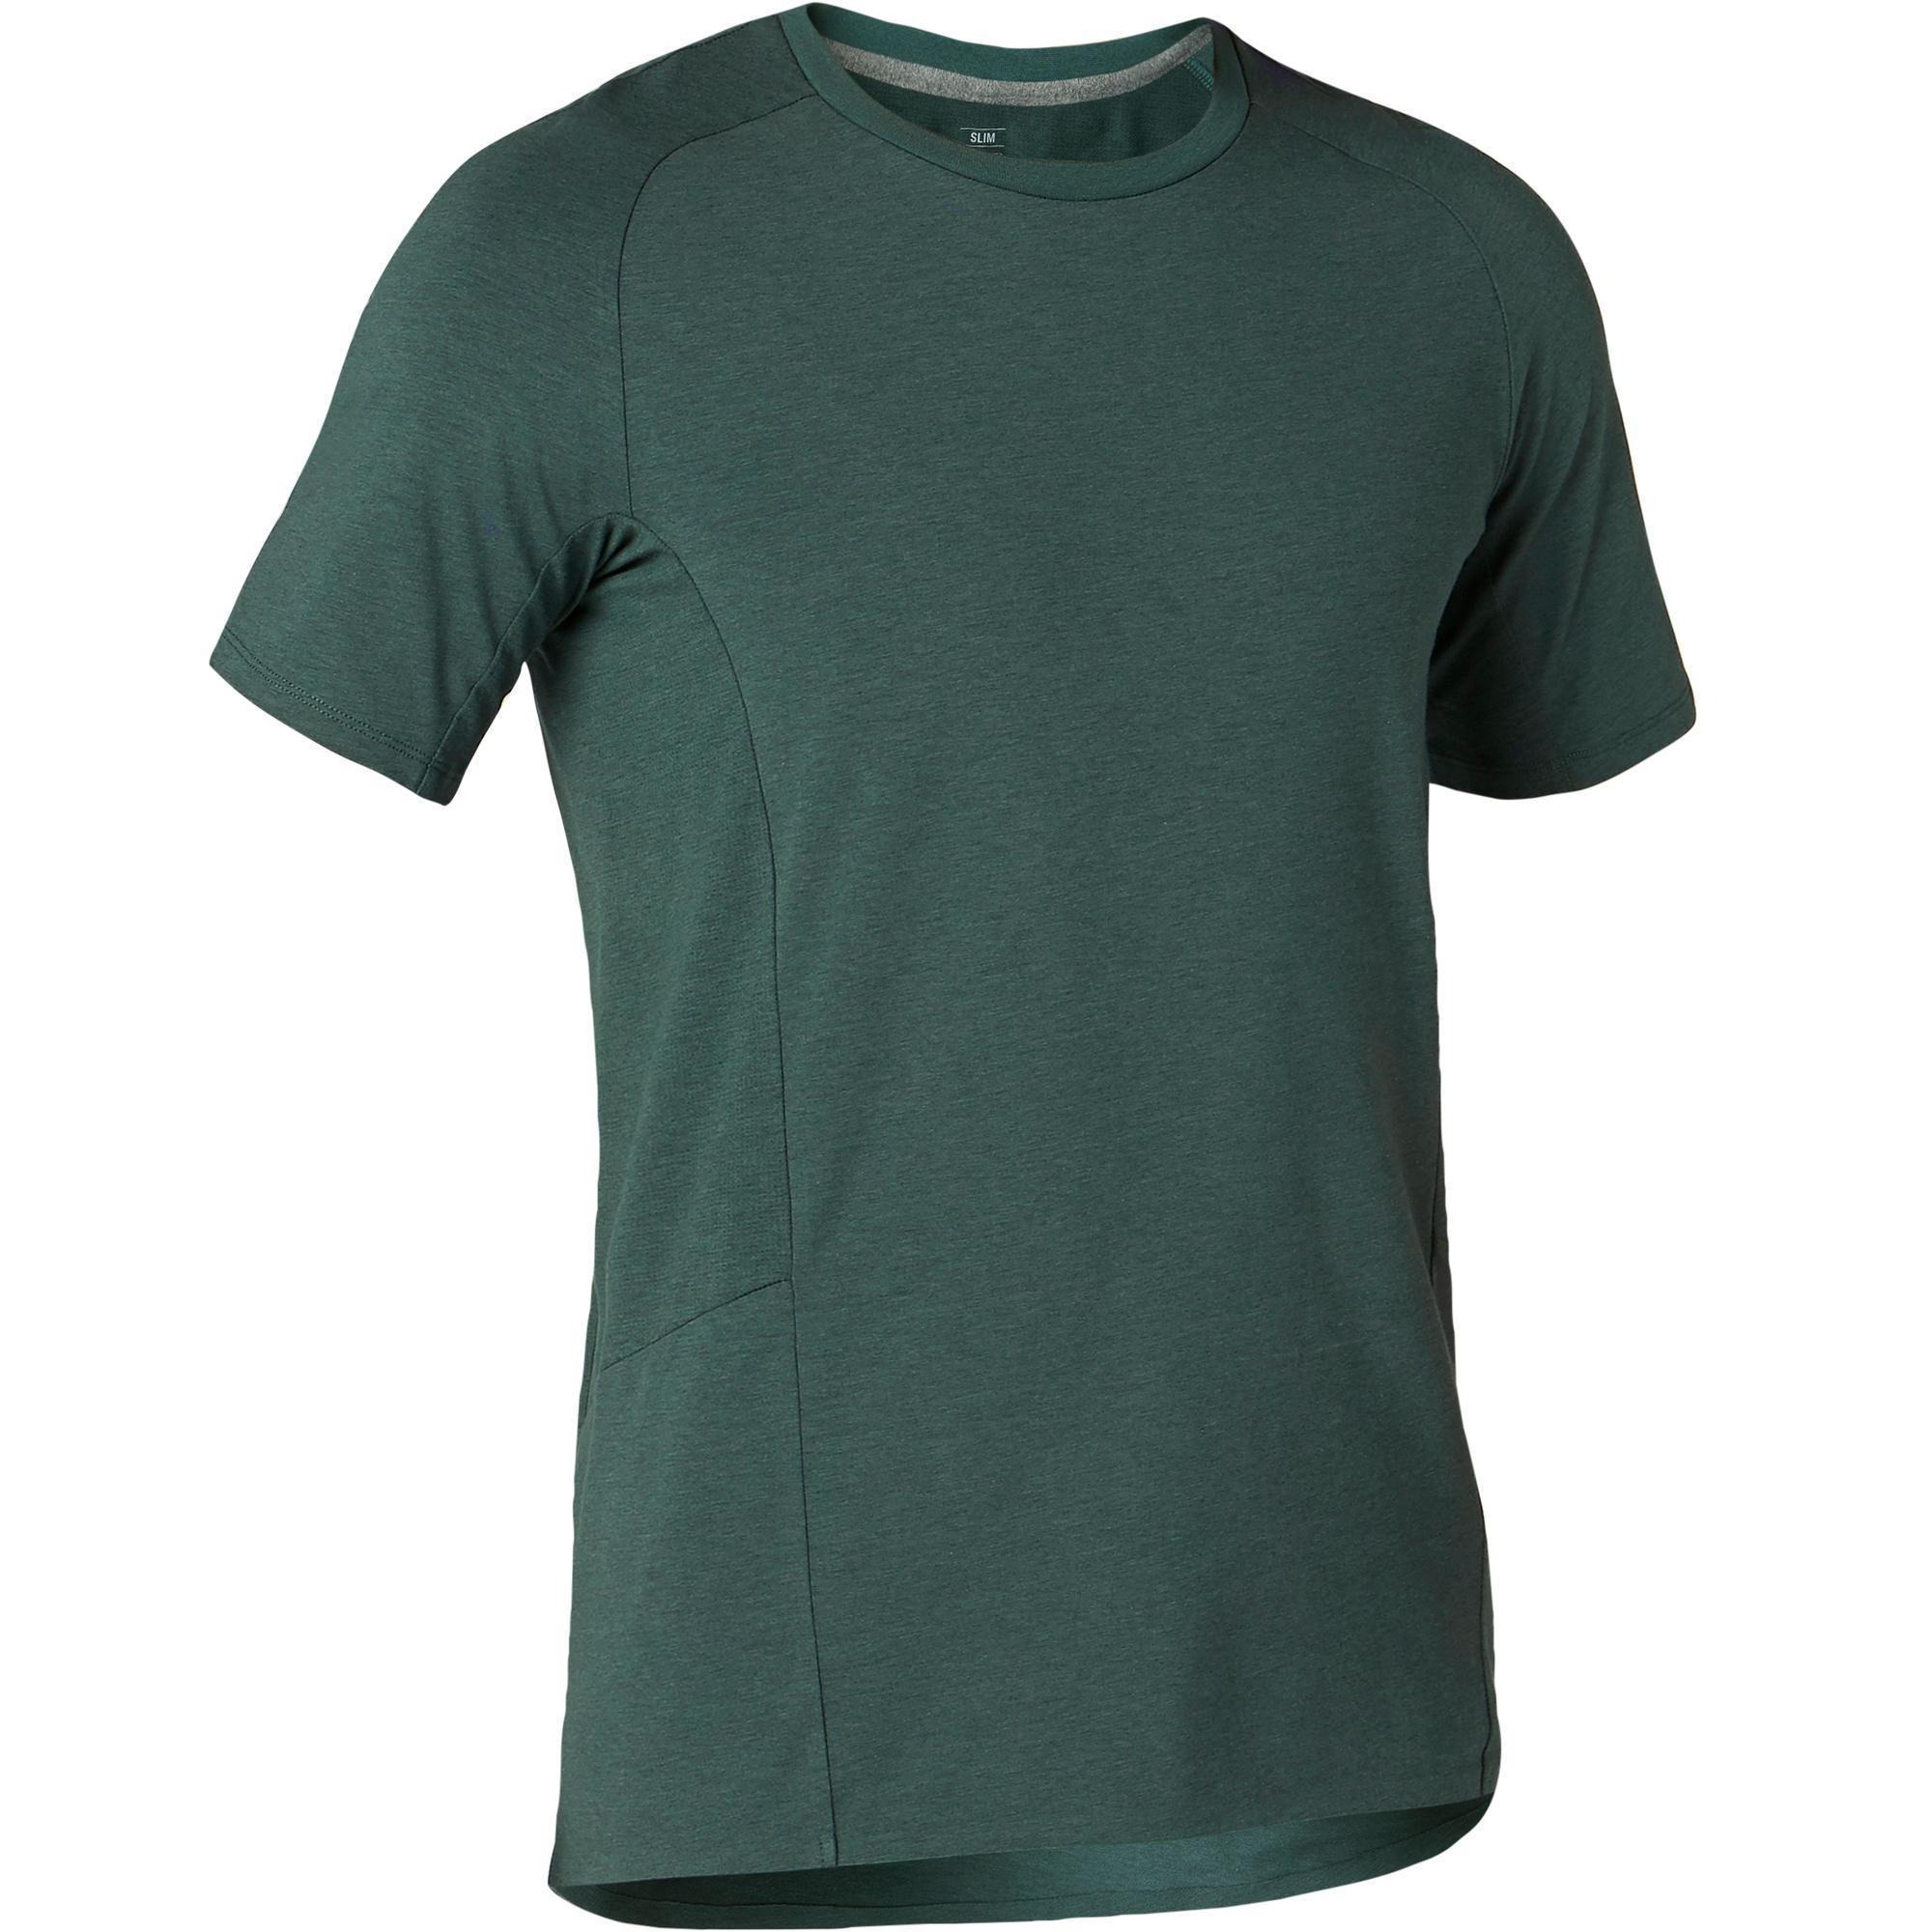 T-Shirt560 Gym & Pilates Herren dunkelgrün | Sportbekleidung > Sportshirts > Poloshirts | Grün | Domyos